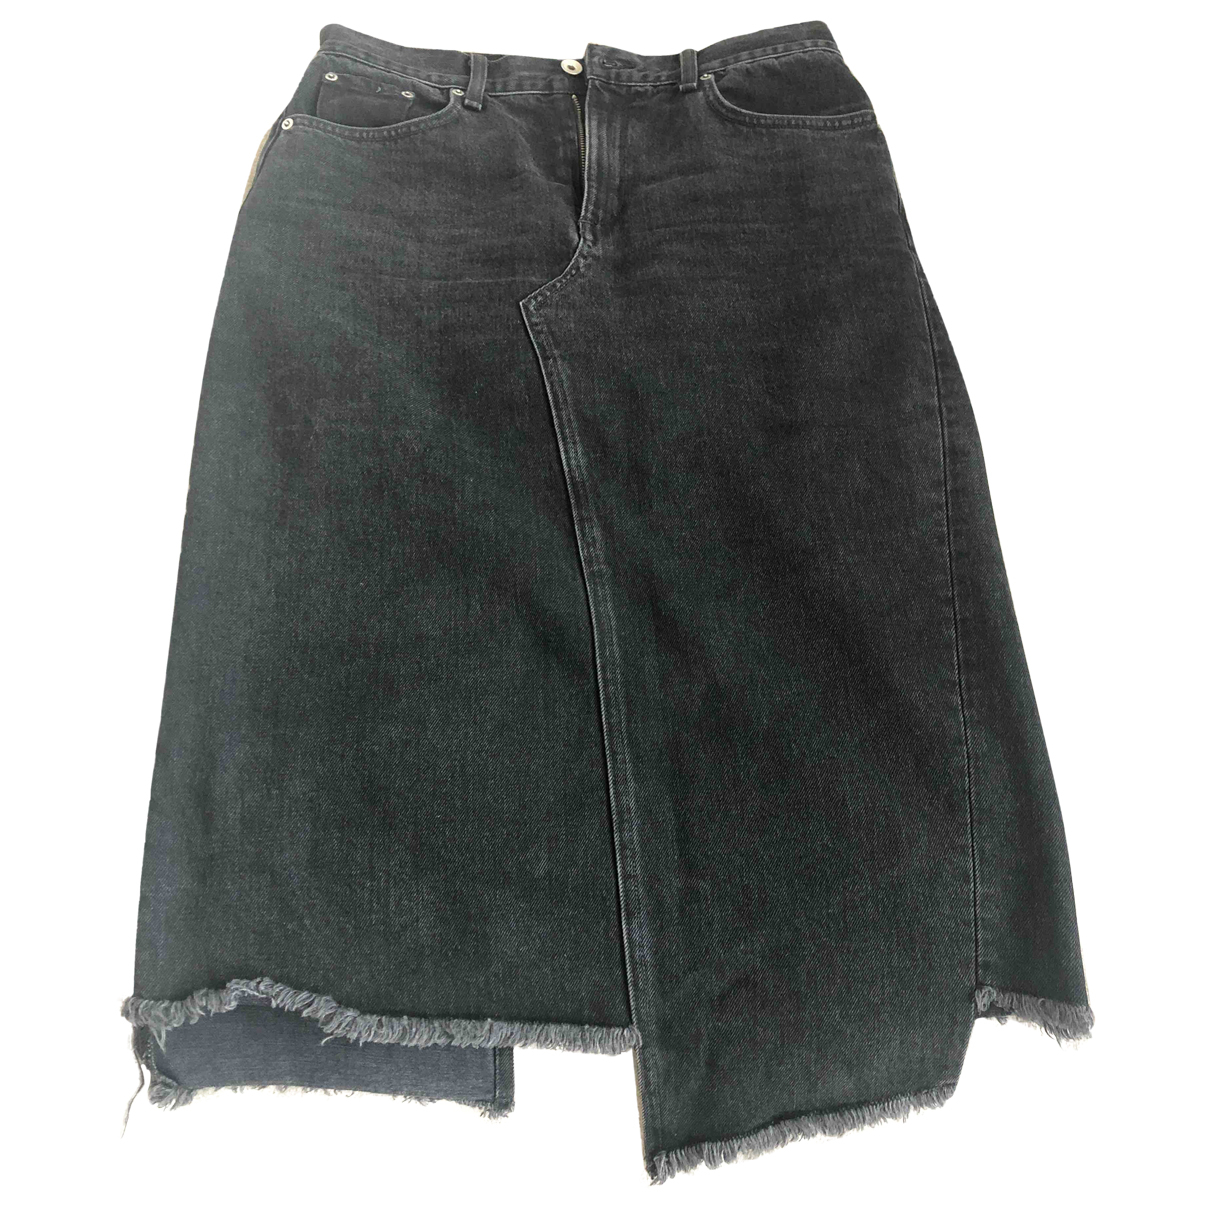 Rag & Bone - Jupe   pour femme en denim - noir